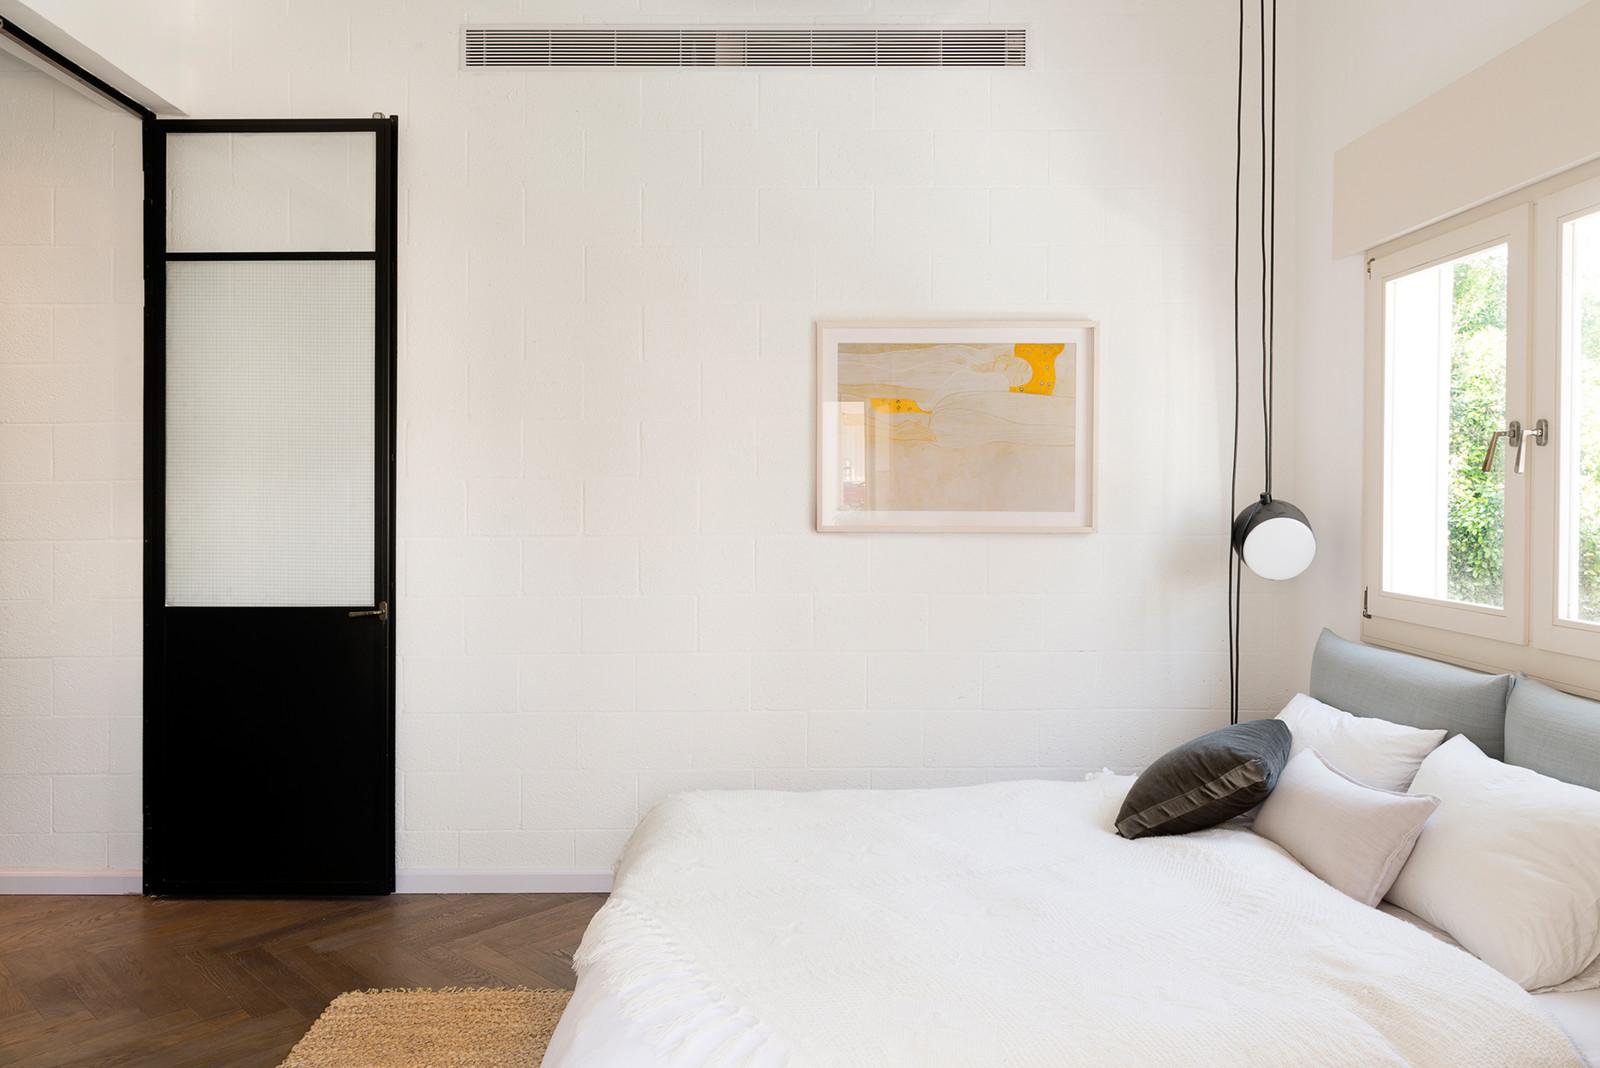 Apartment-renovation-just3ds.com-13